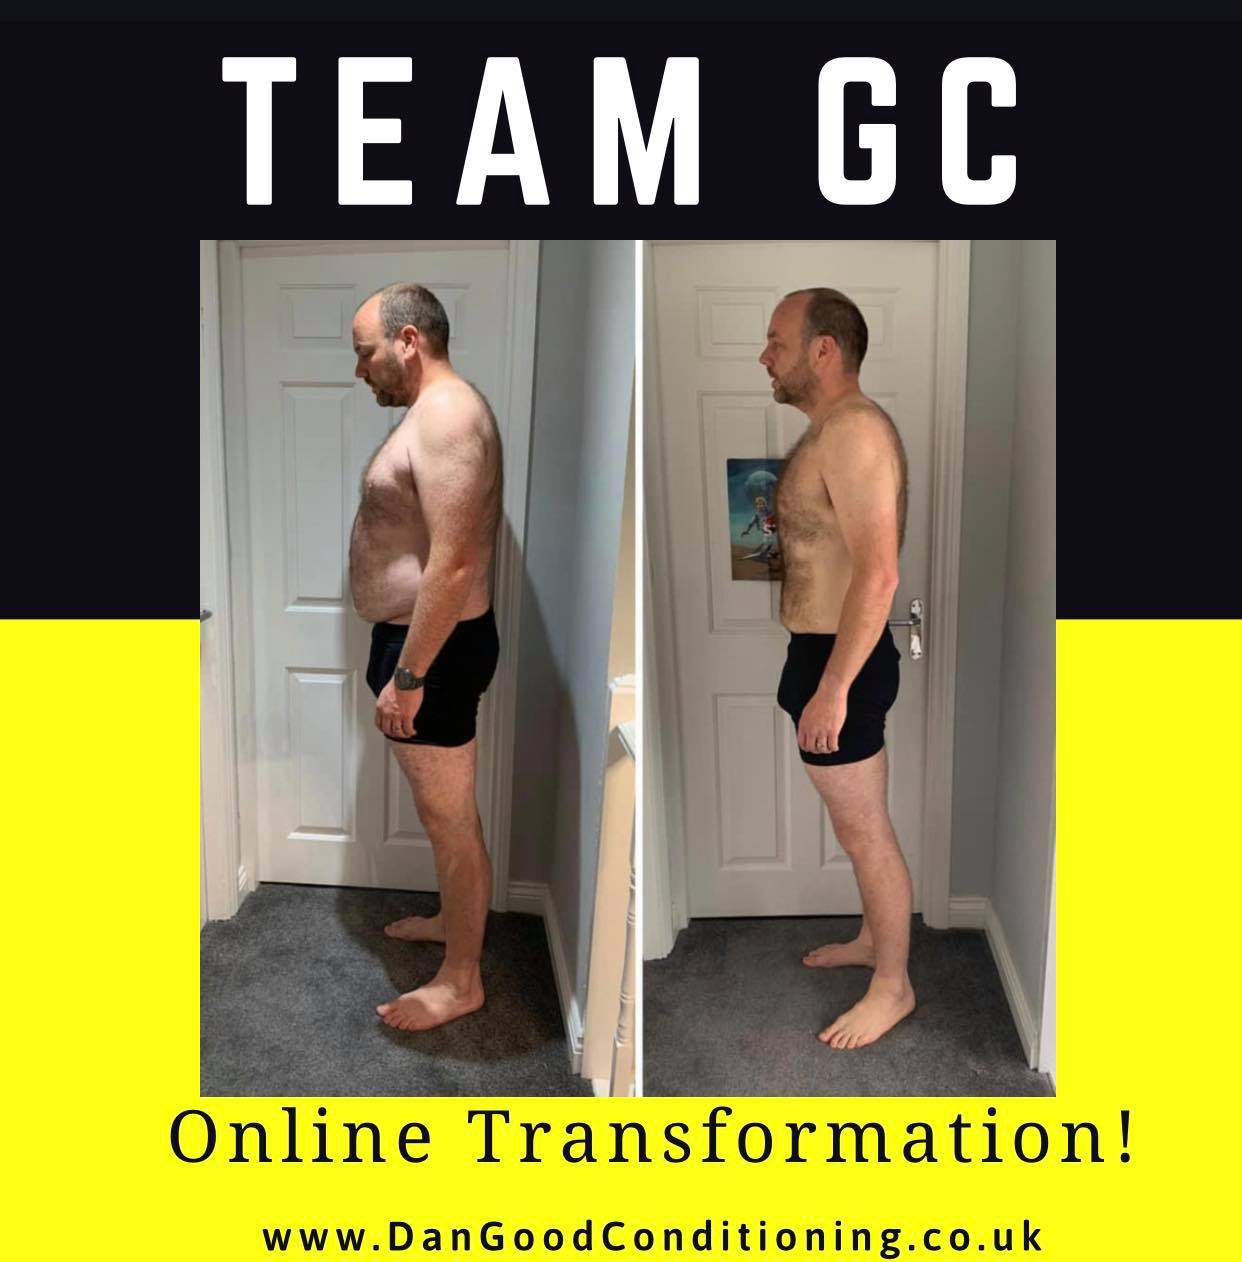 Kev McConnell - Team GC Member